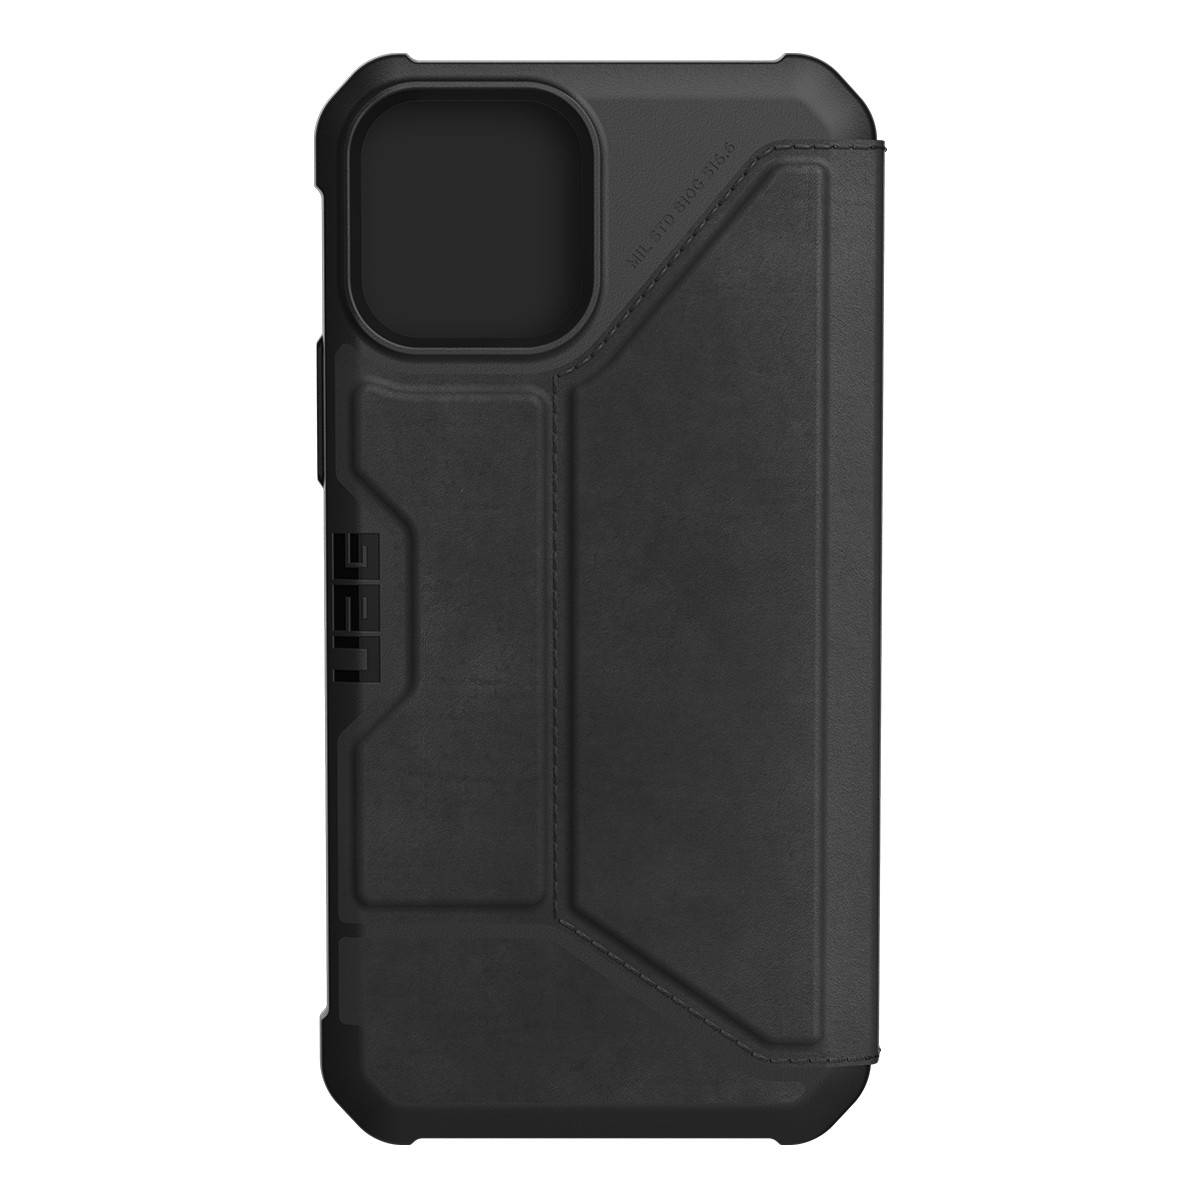 UAG Metropolis Wallet läderfodral, iPhone 12/12 Pro, svart